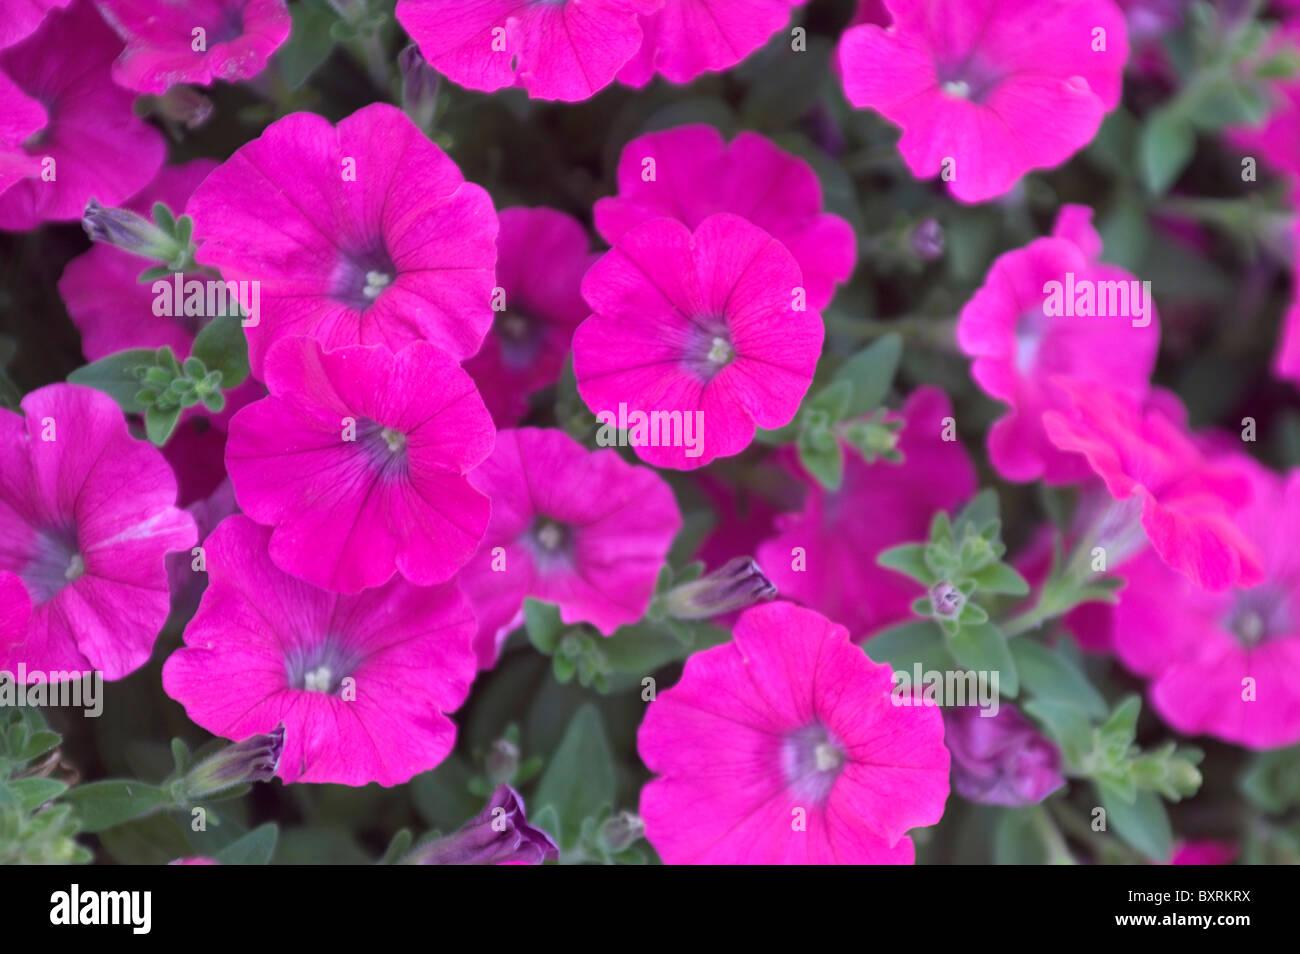 Lithuania, Vilnius, Petunias in bloom - Stock Image